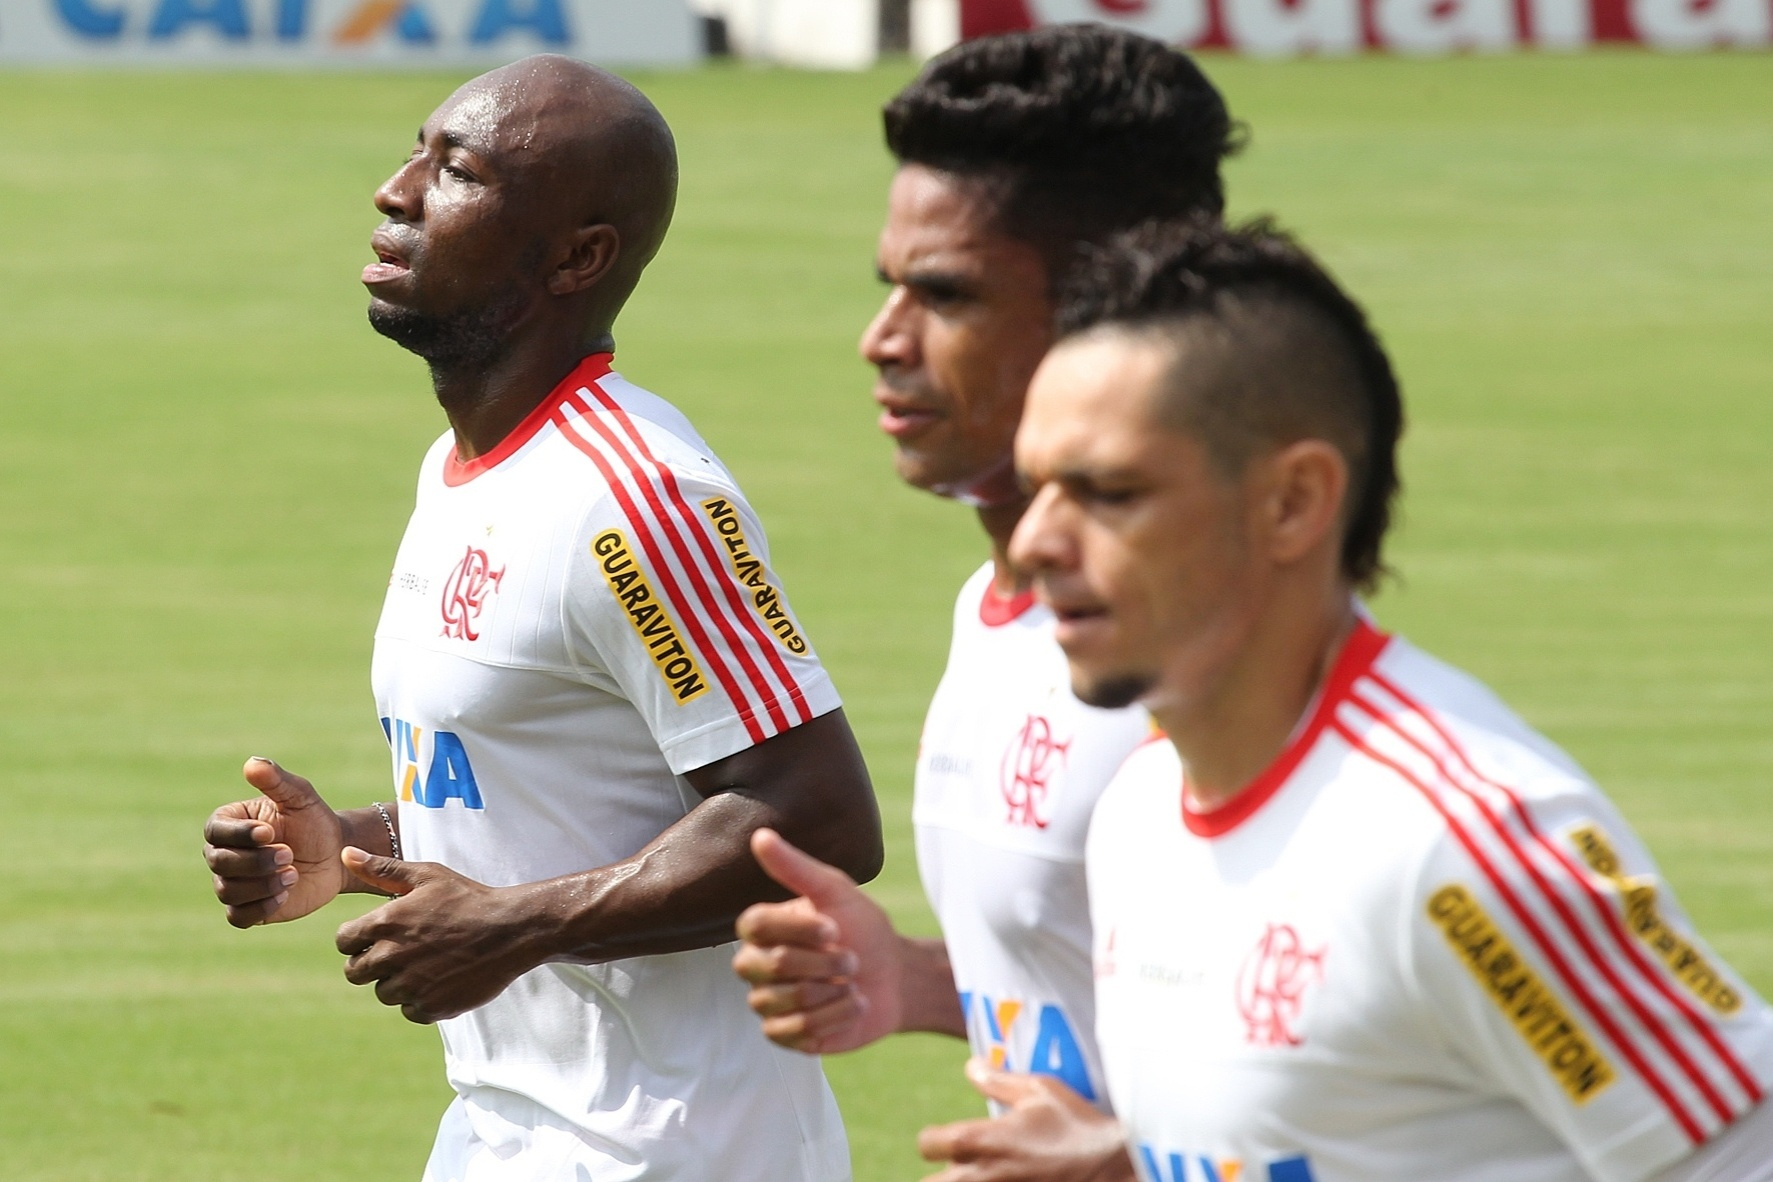 27 abr. 2015 - Ao lado de Almir e Pará, Armero participa de treino físico no Flamengo